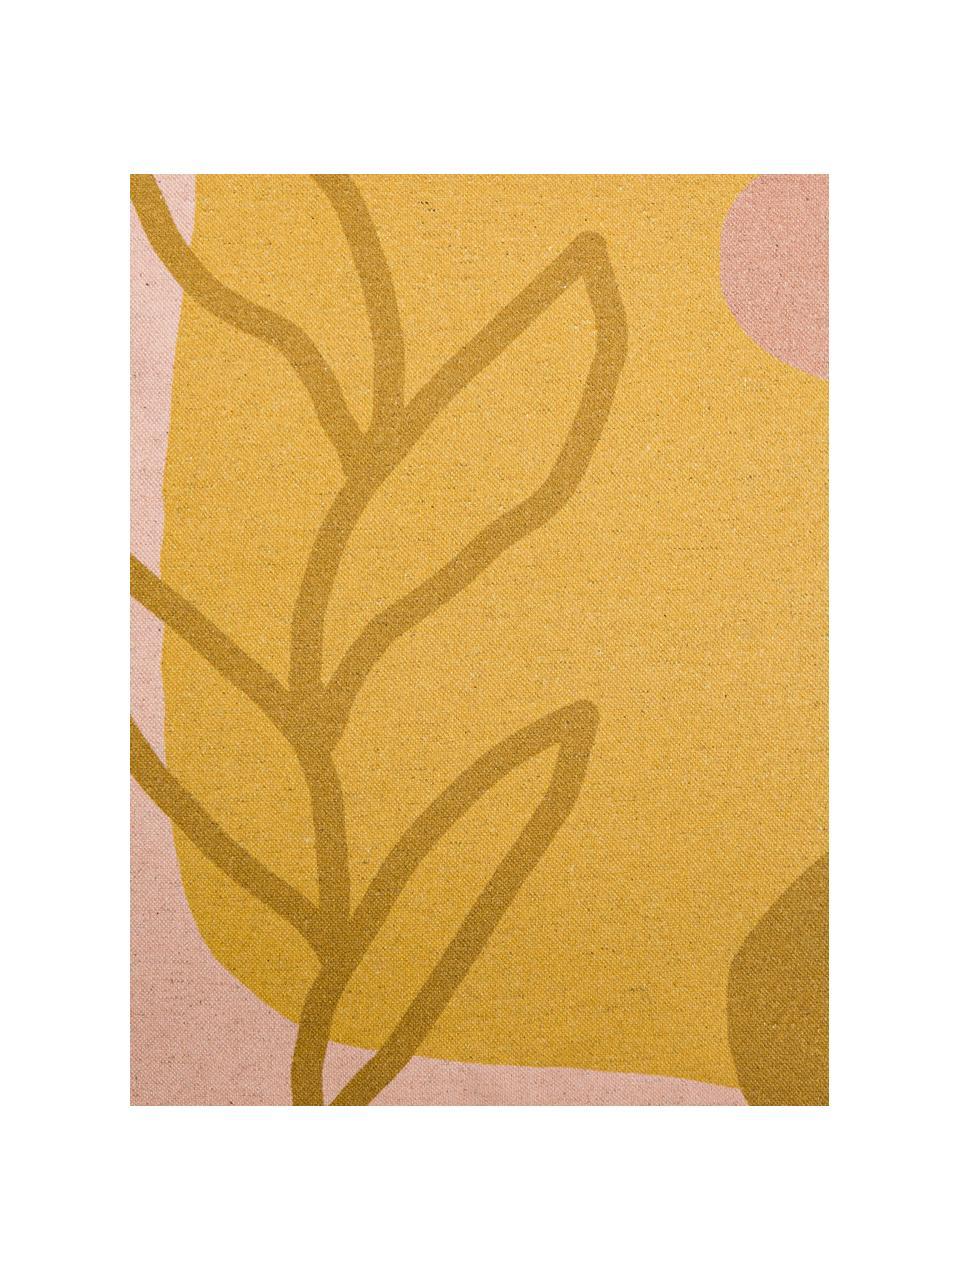 Kissenhülle Images mit abstraktem Motiv, 85% Baumwolle, 15% Leinen, Gelb, Rosa, Hellbraun, 50 x 50 cm